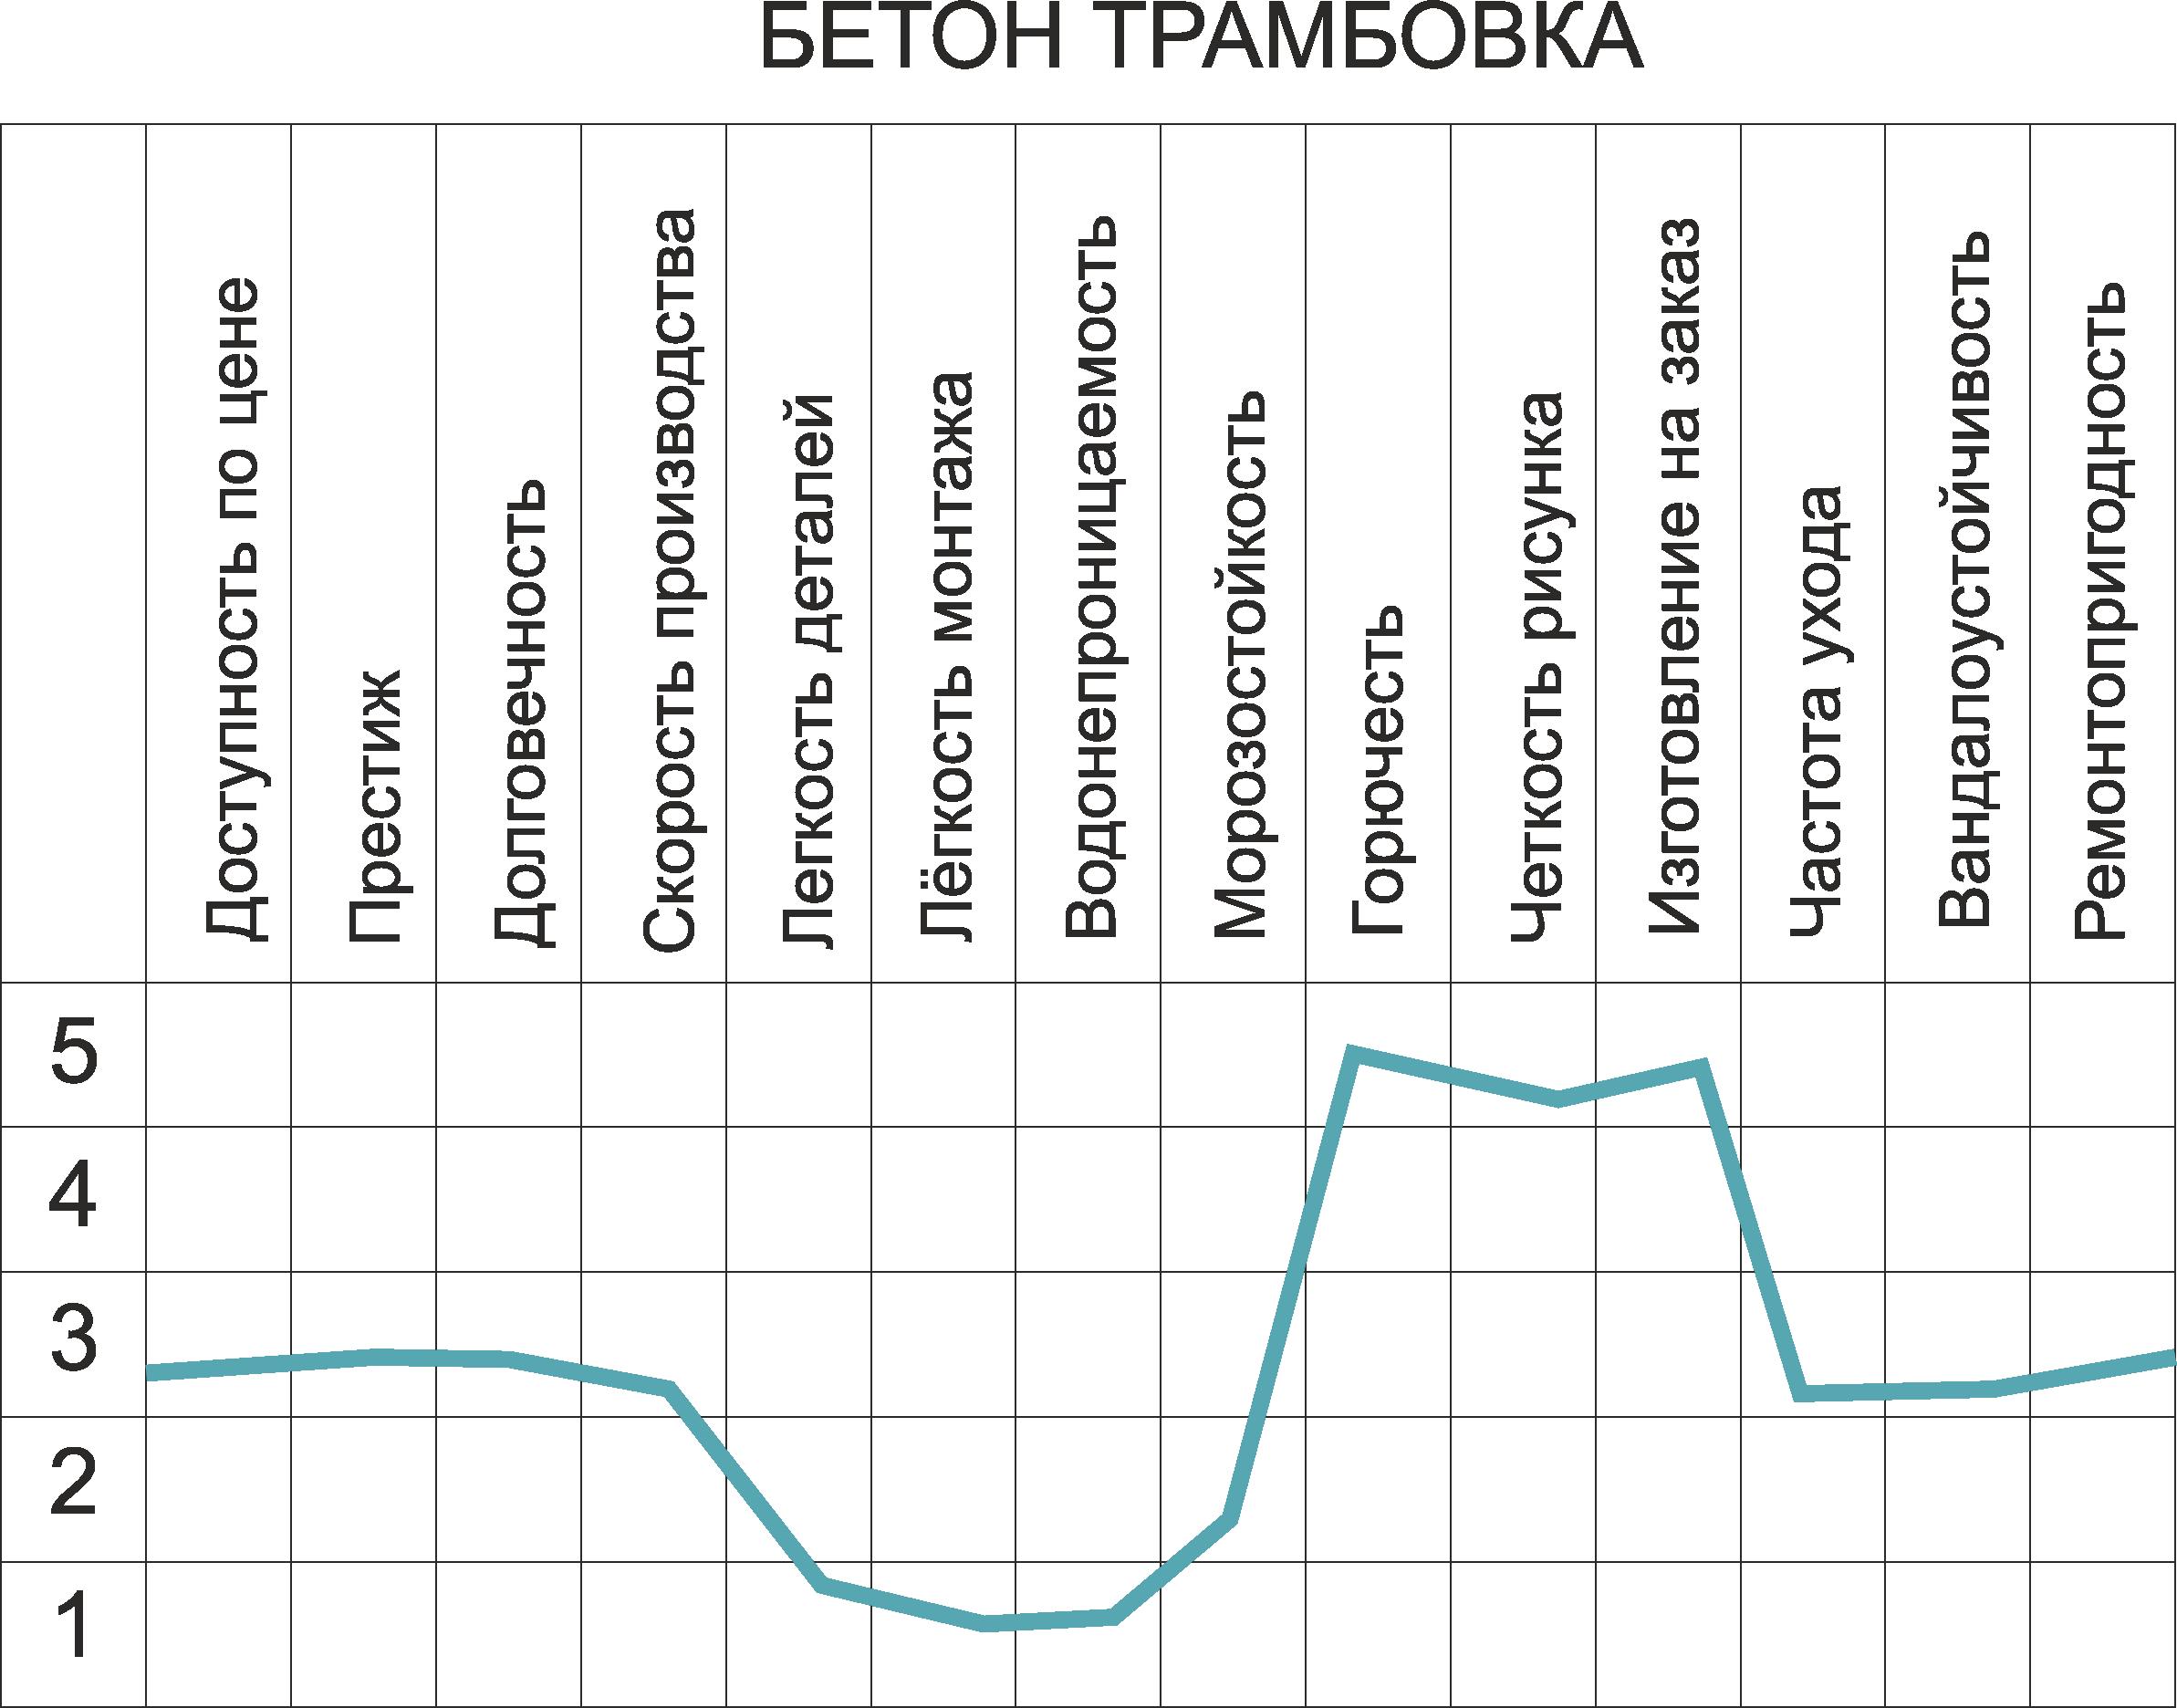 Бетон трамбовка